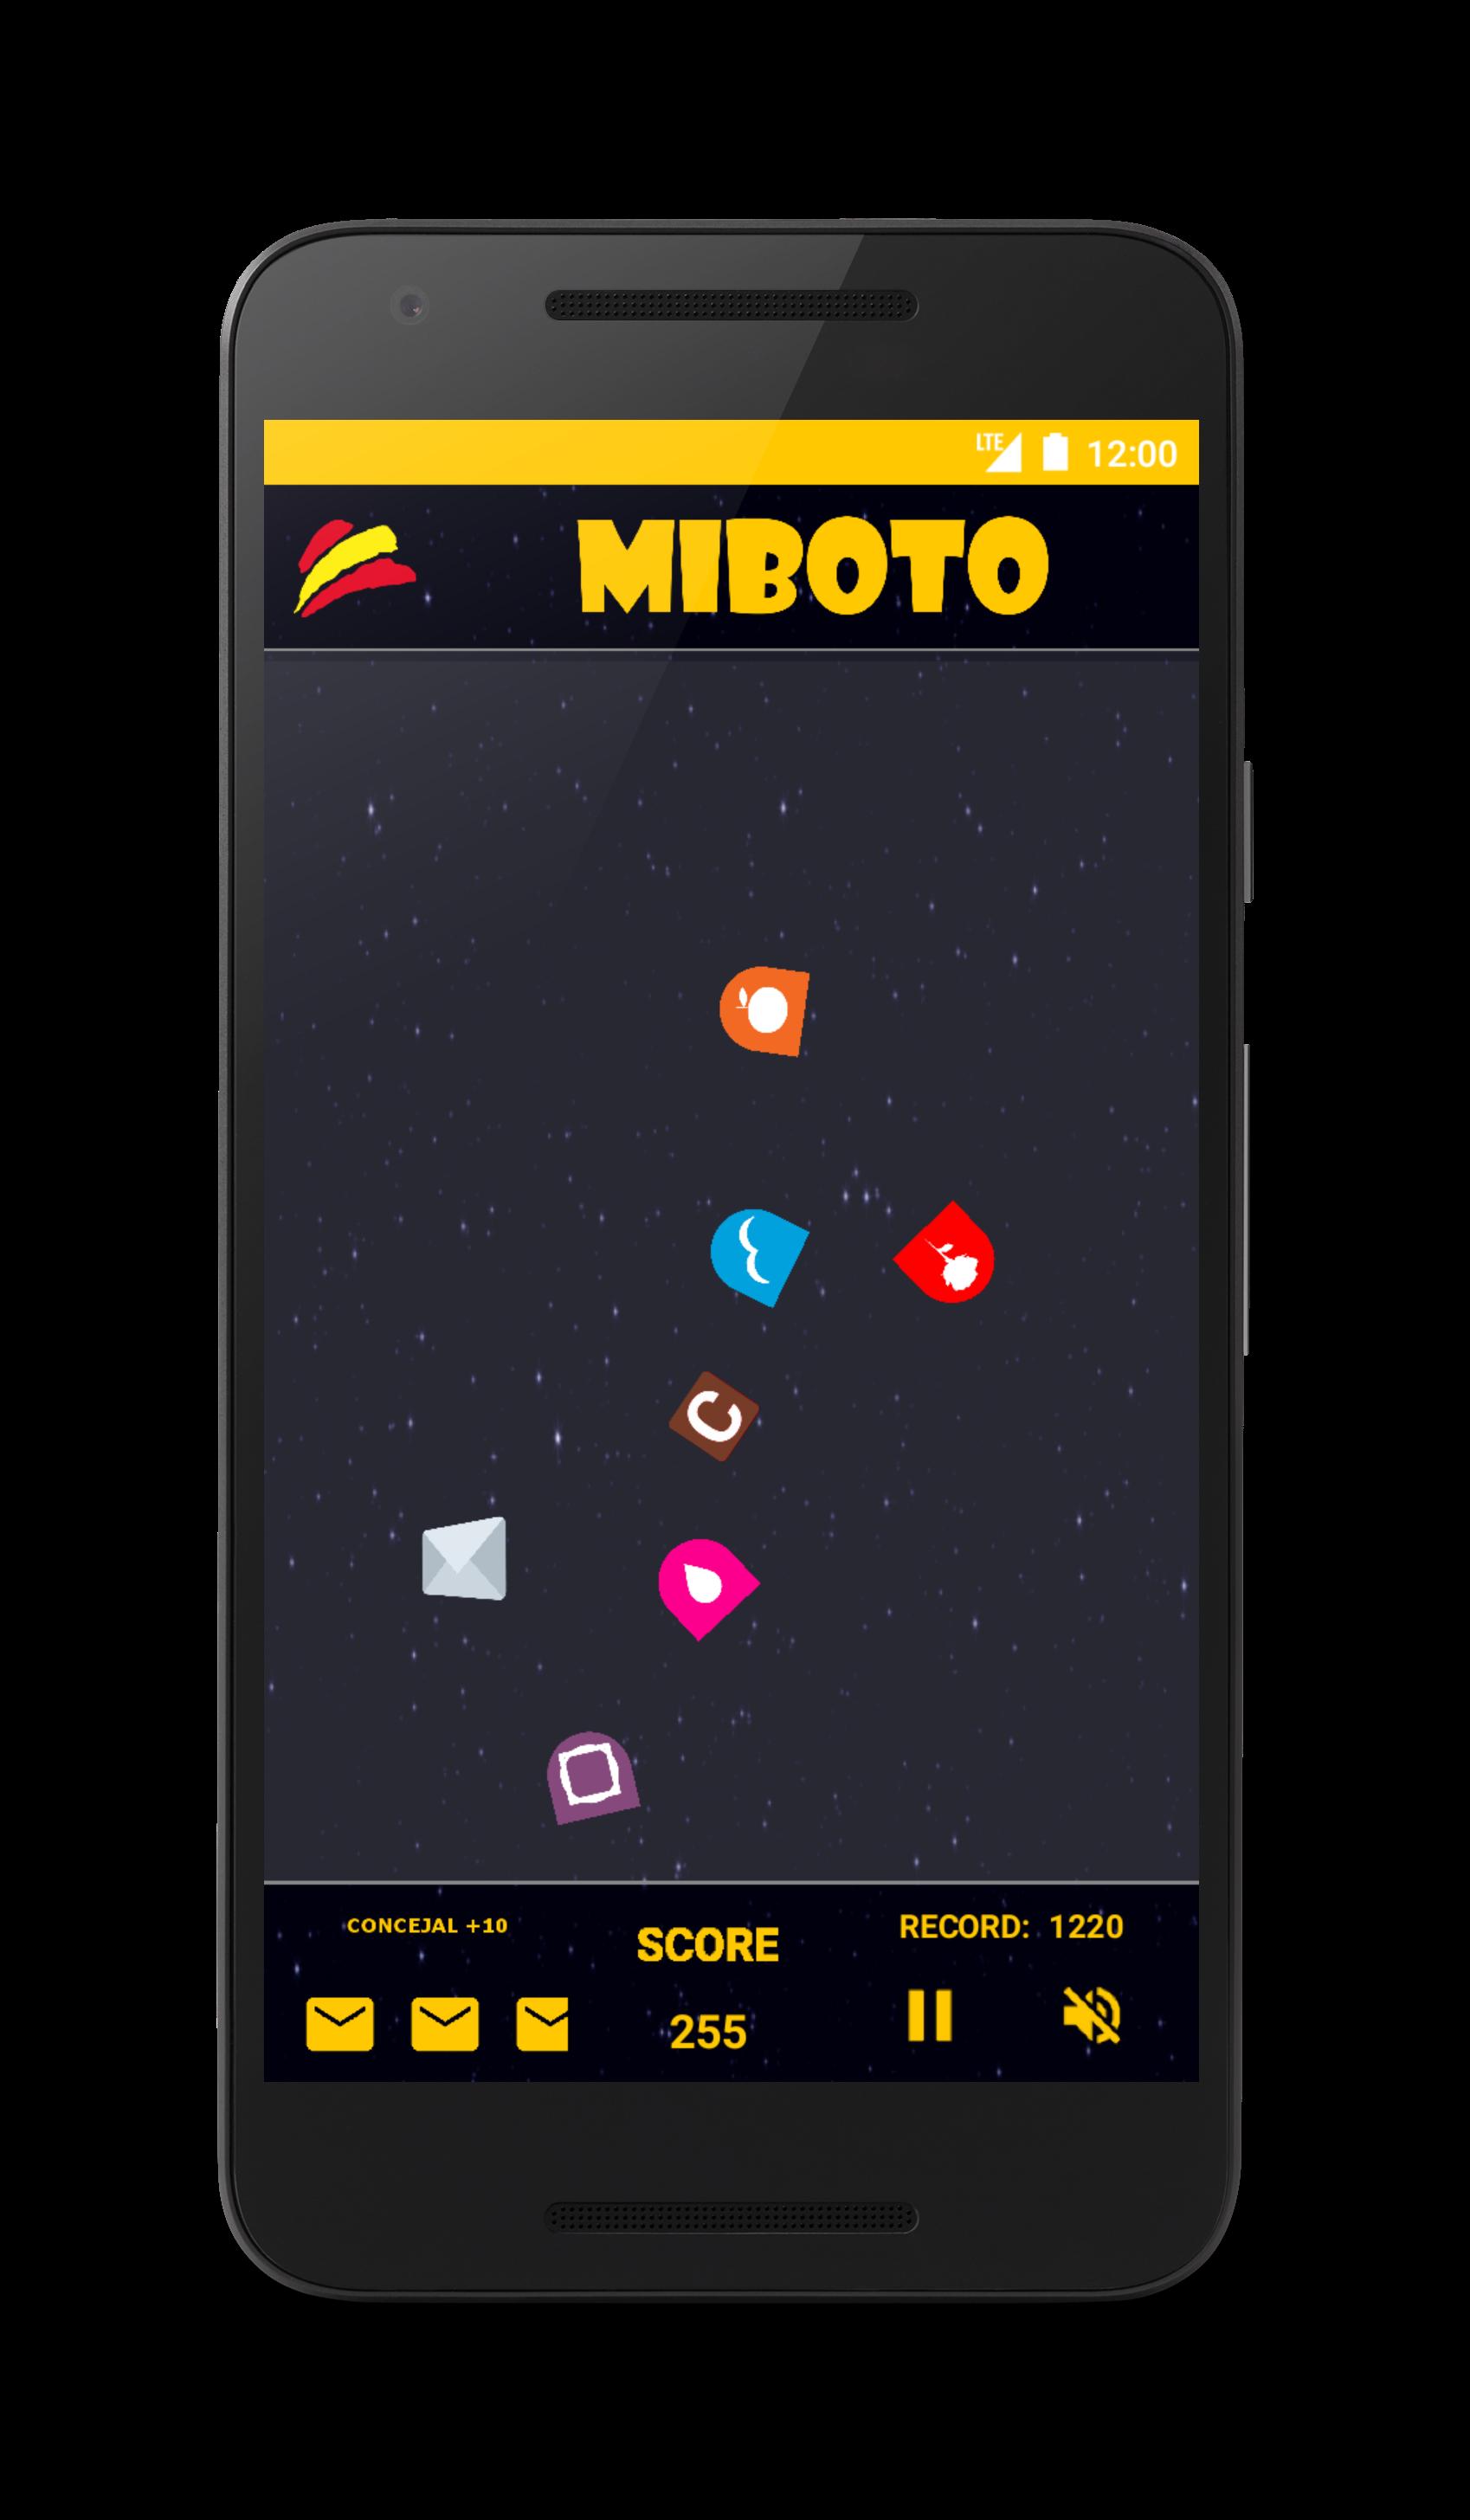 MIBOTO - a sidereal traveler